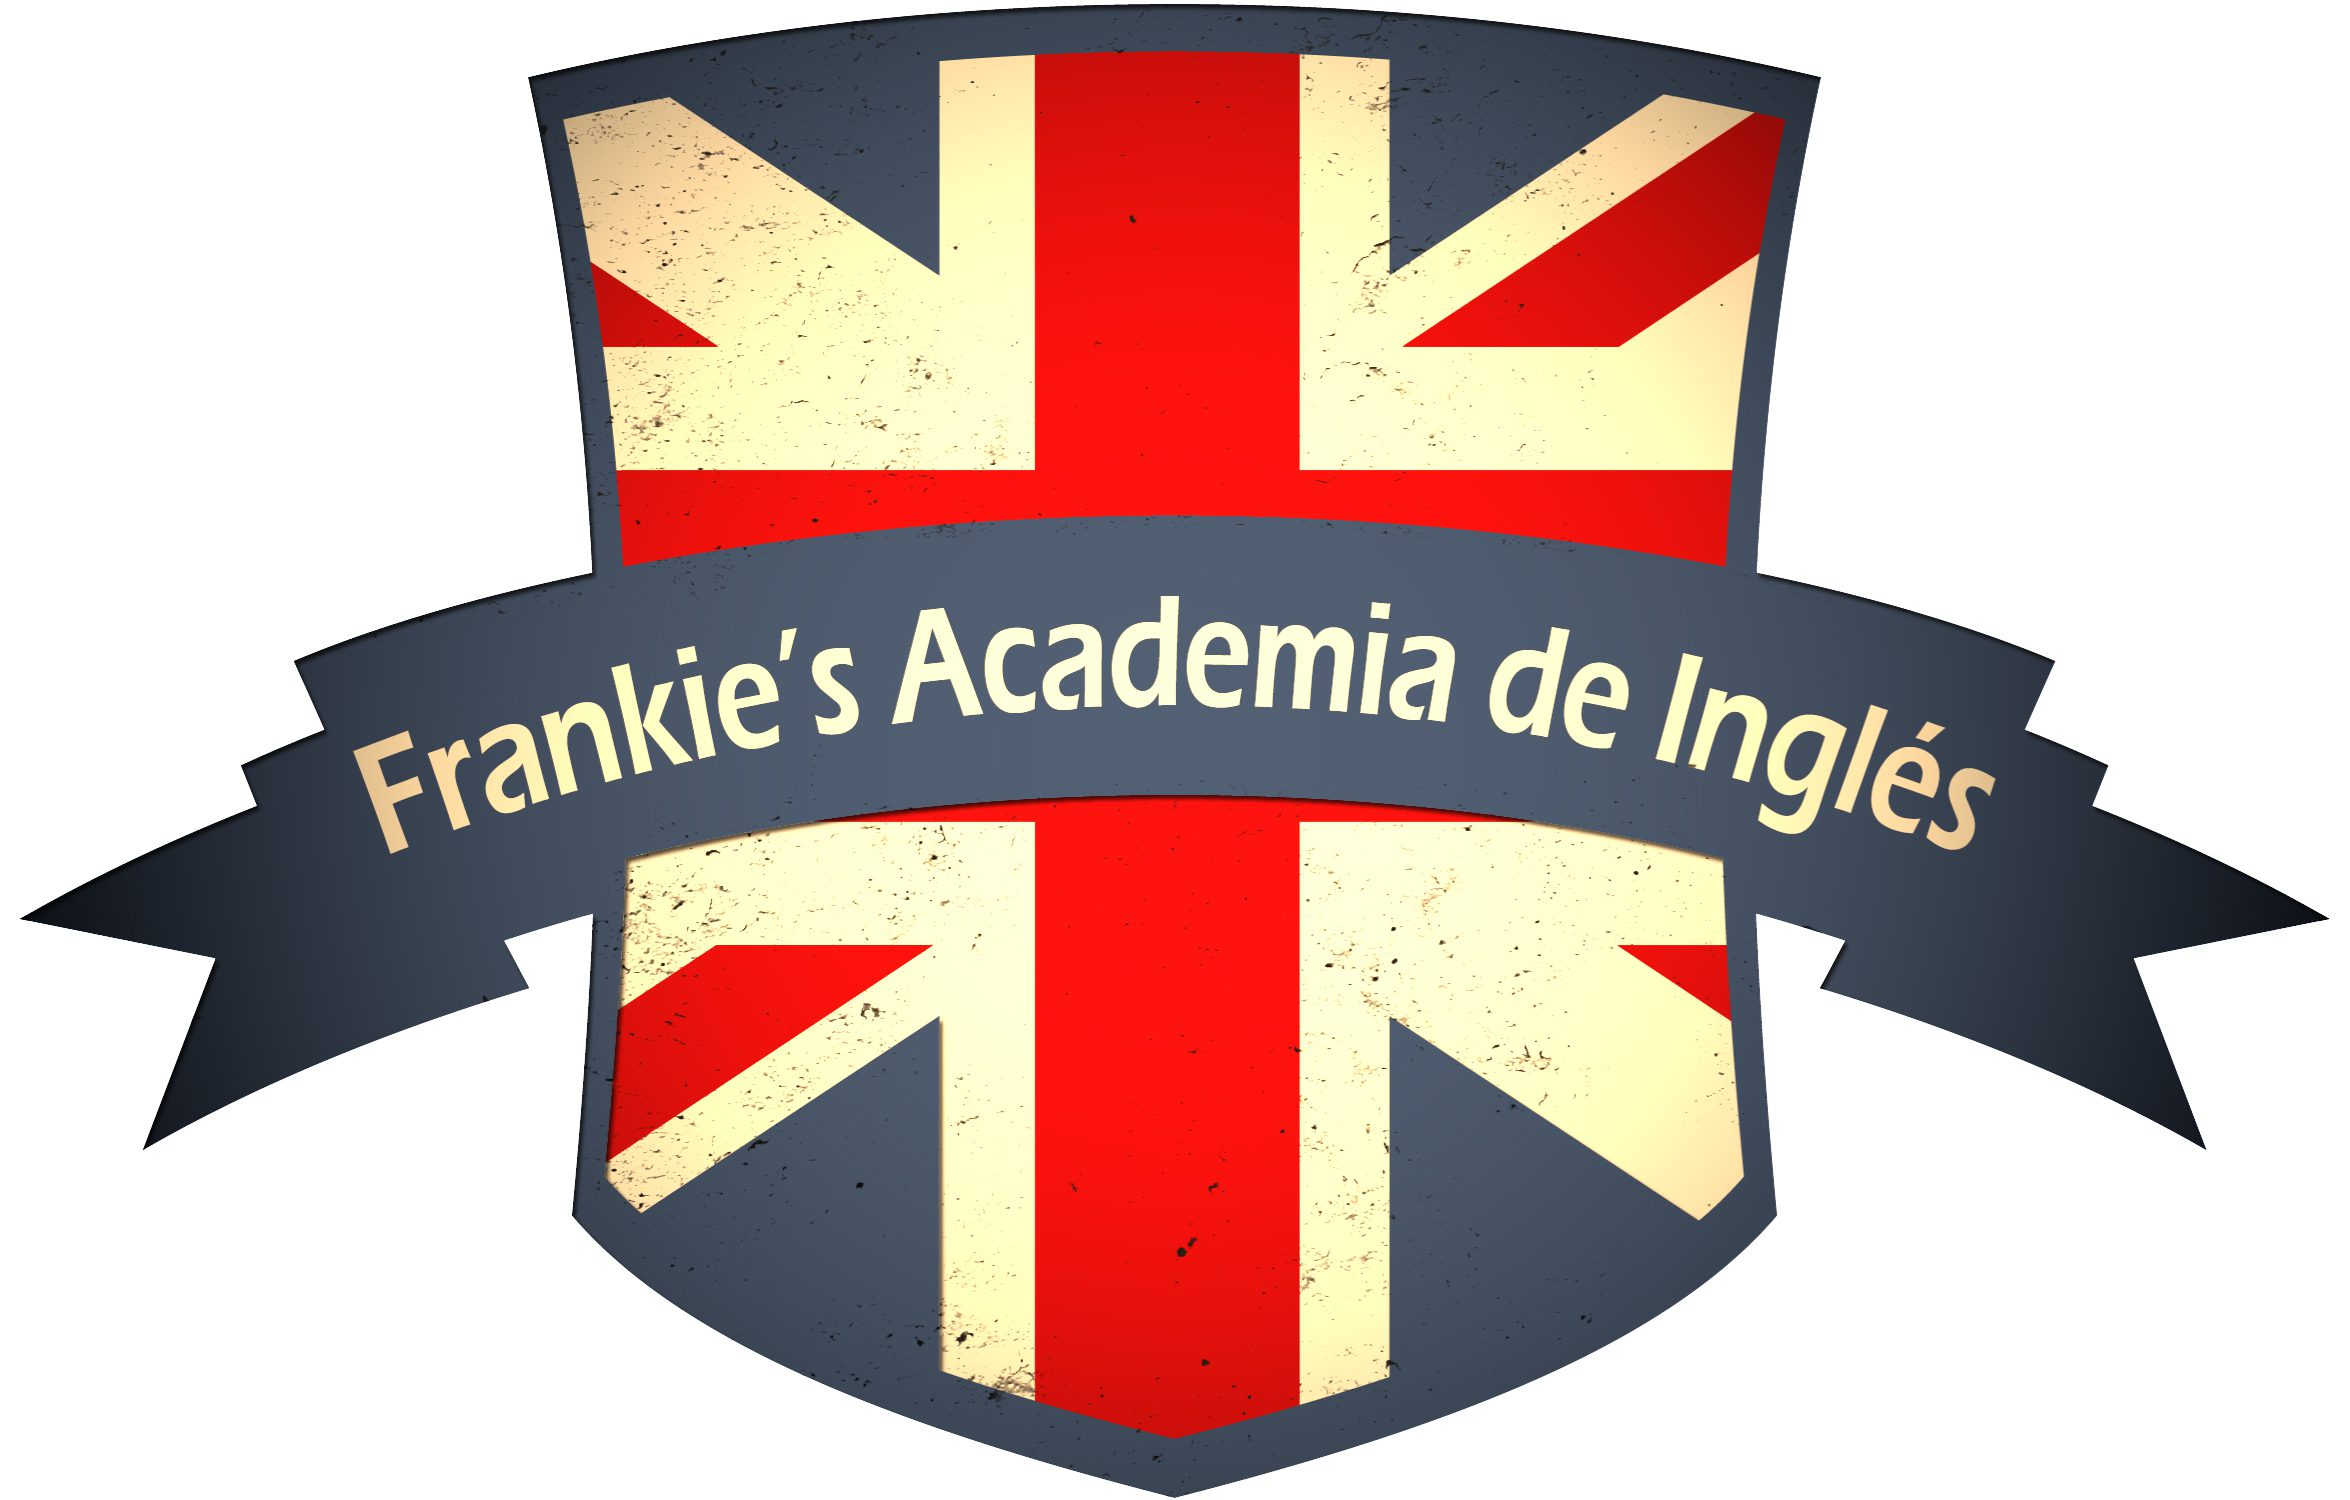 Frankie's Academia